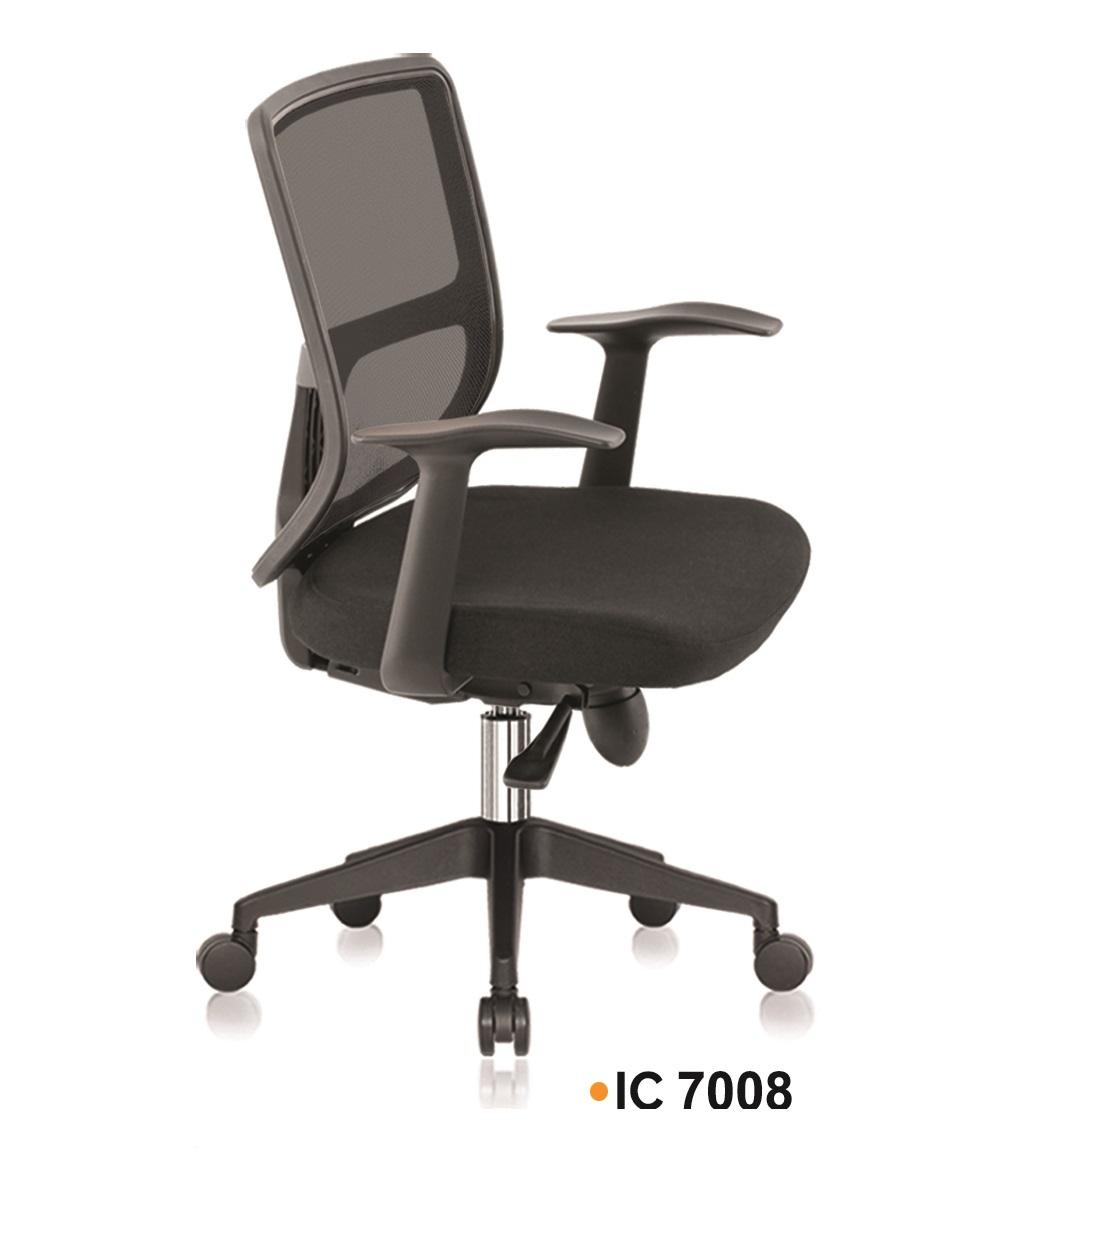 Kursi Kantor Ichiko IC 7008